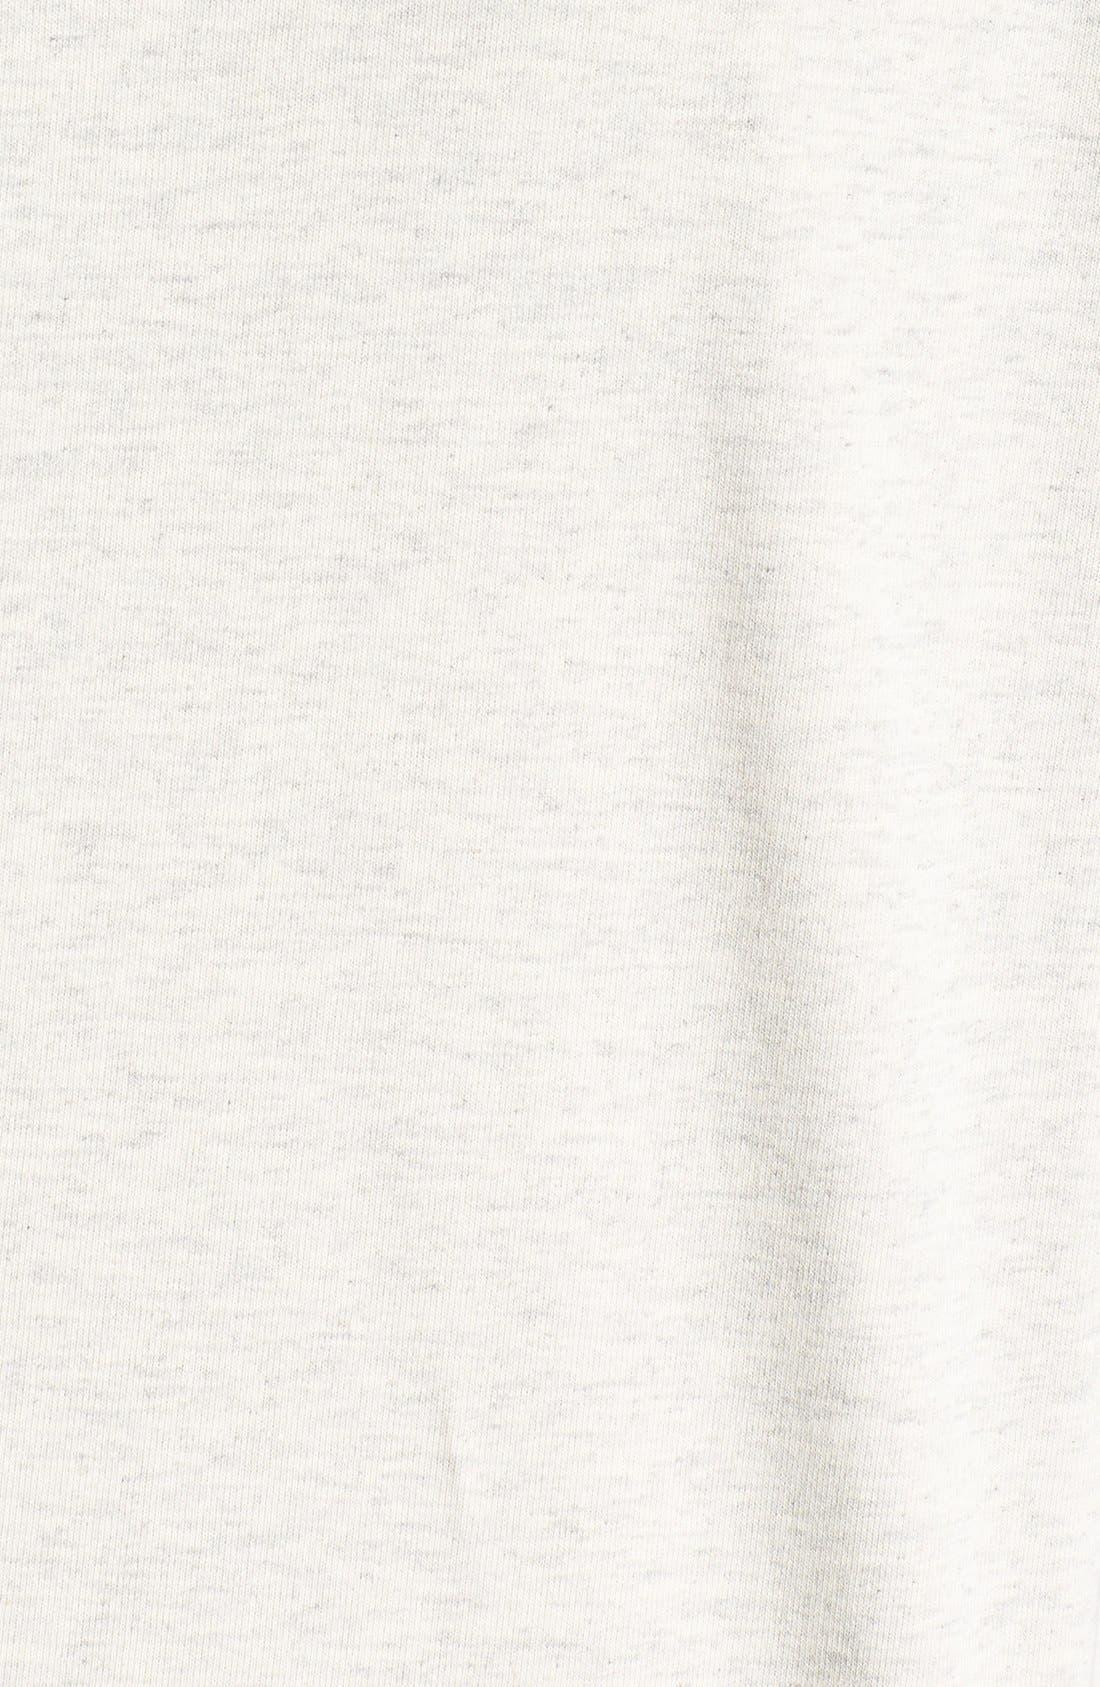 TODD SNYDER + CHAMPION, Shawl Collar Sweatshirt, Alternate thumbnail 2, color, 050